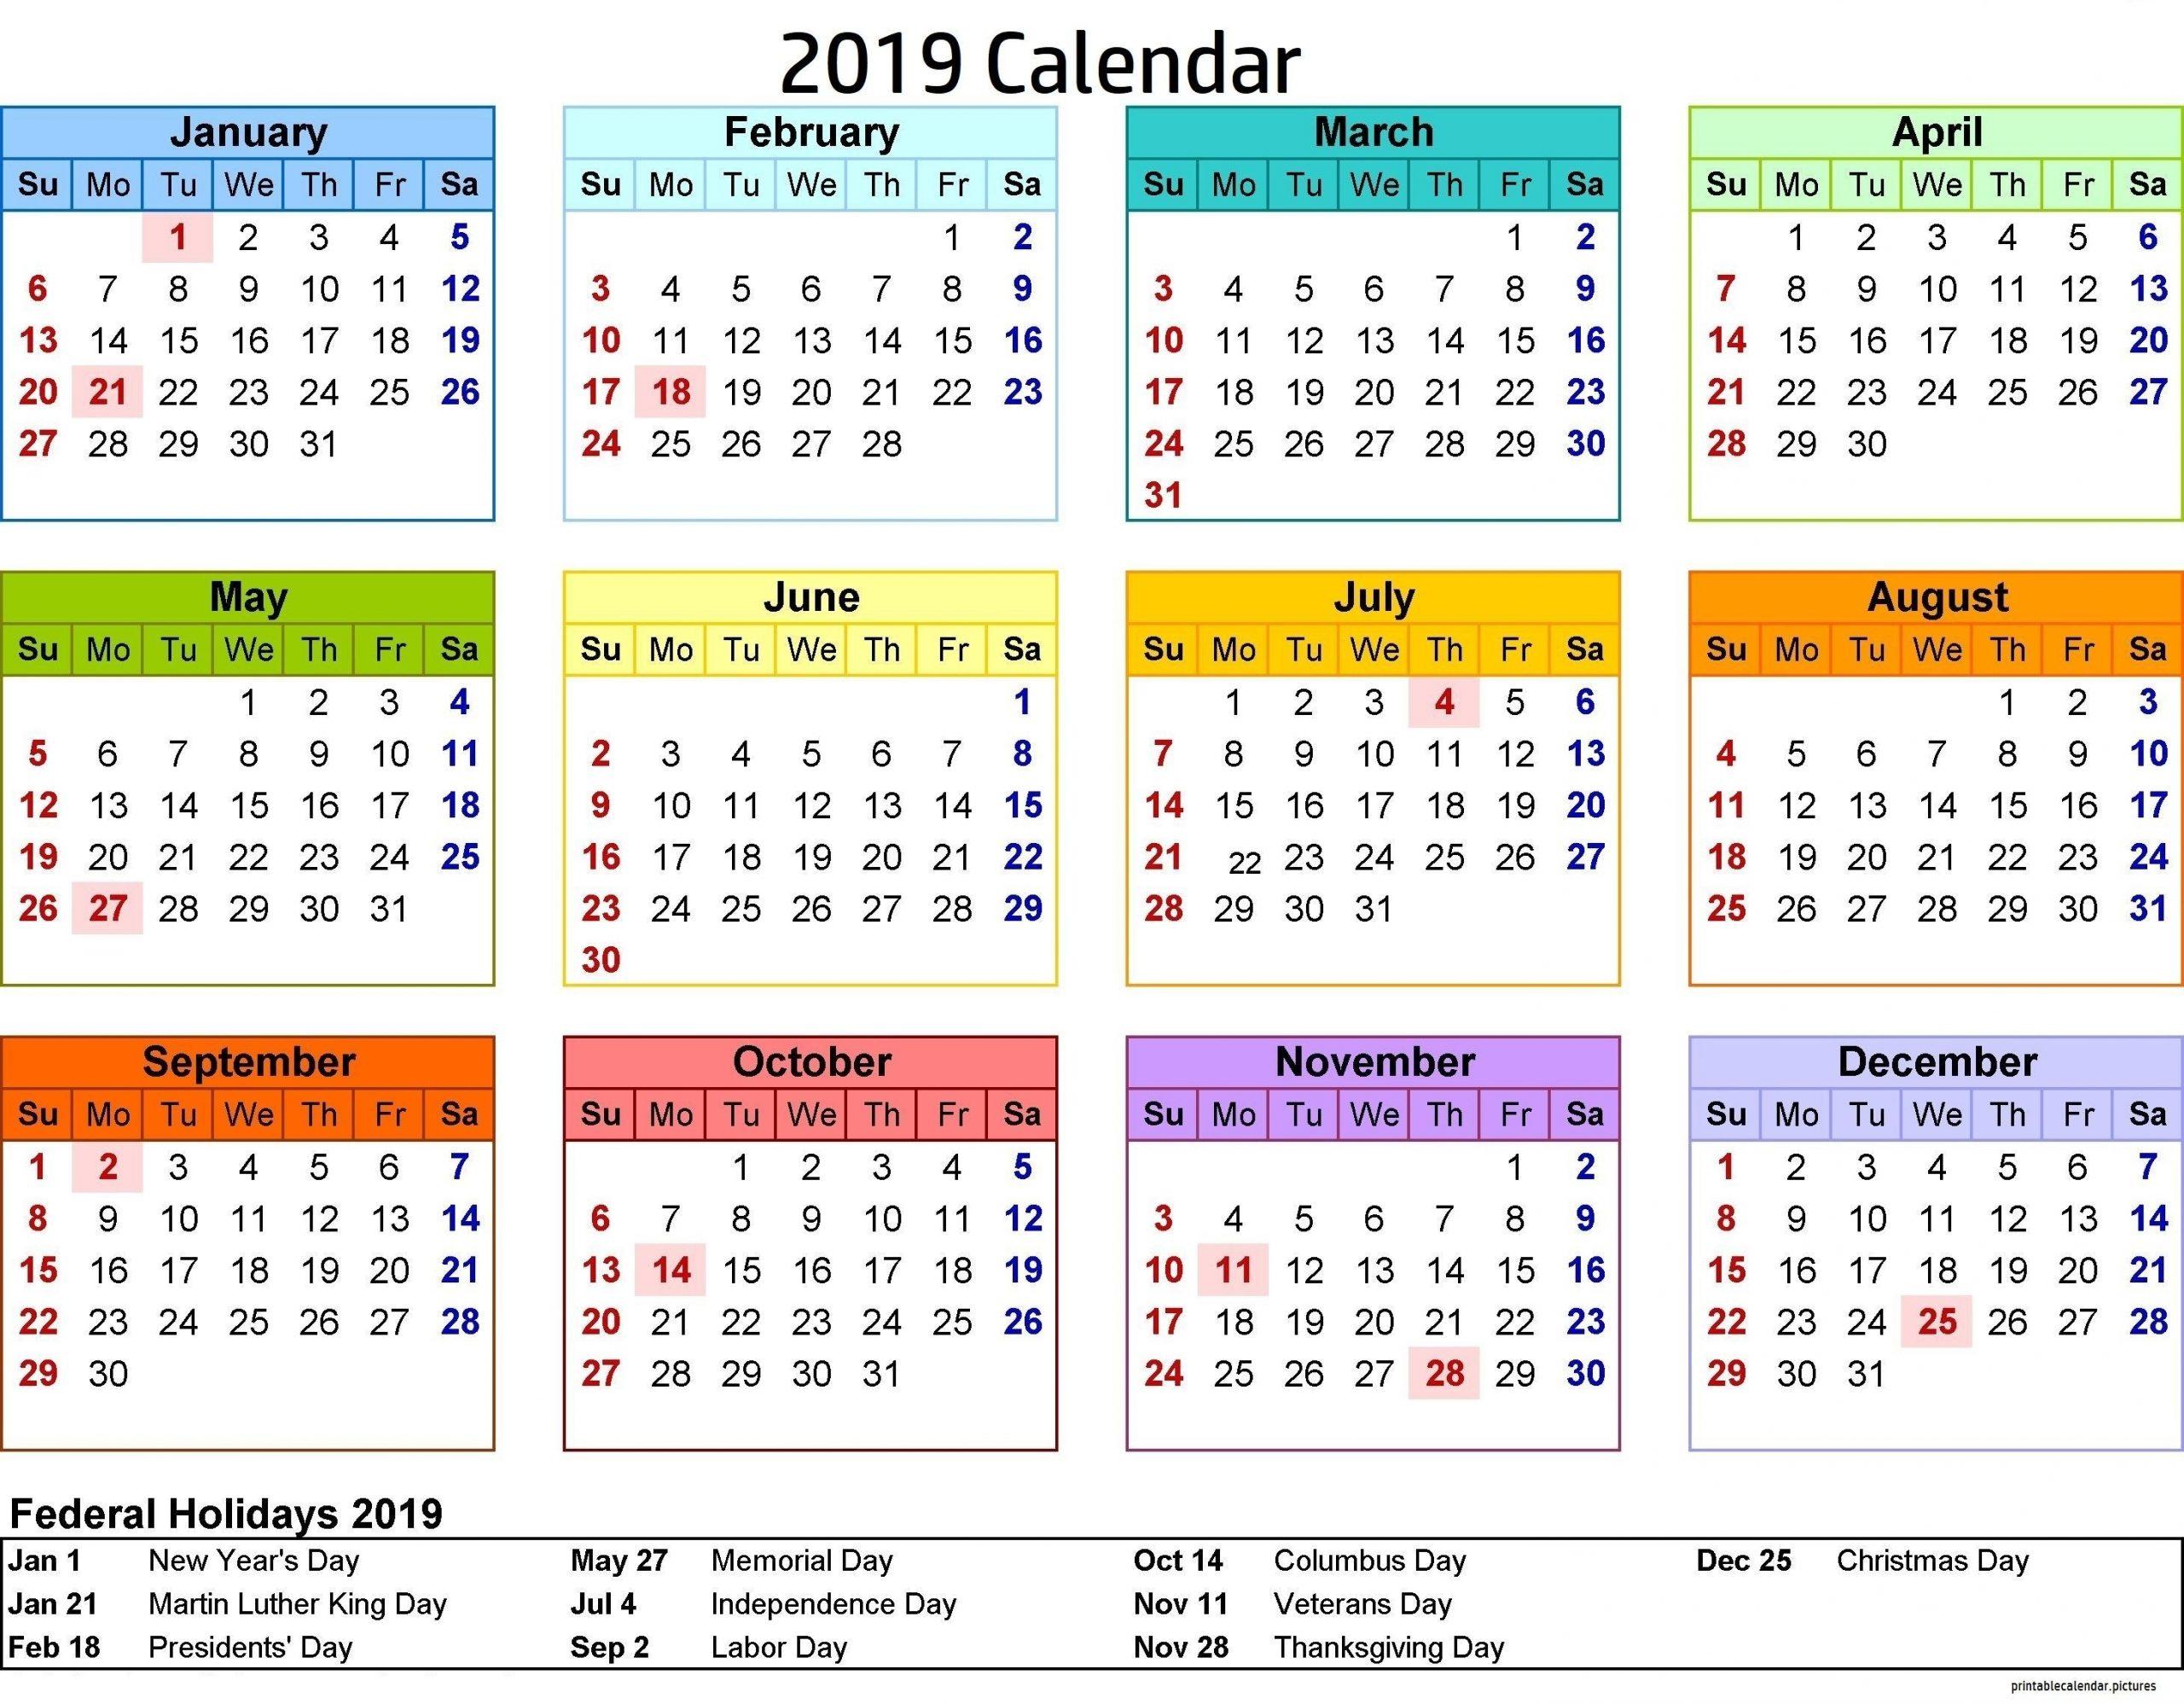 2019 Calendar Philippines With Holidays | Calendar 2019-Print Philippine 2021 Calendars With Holiday